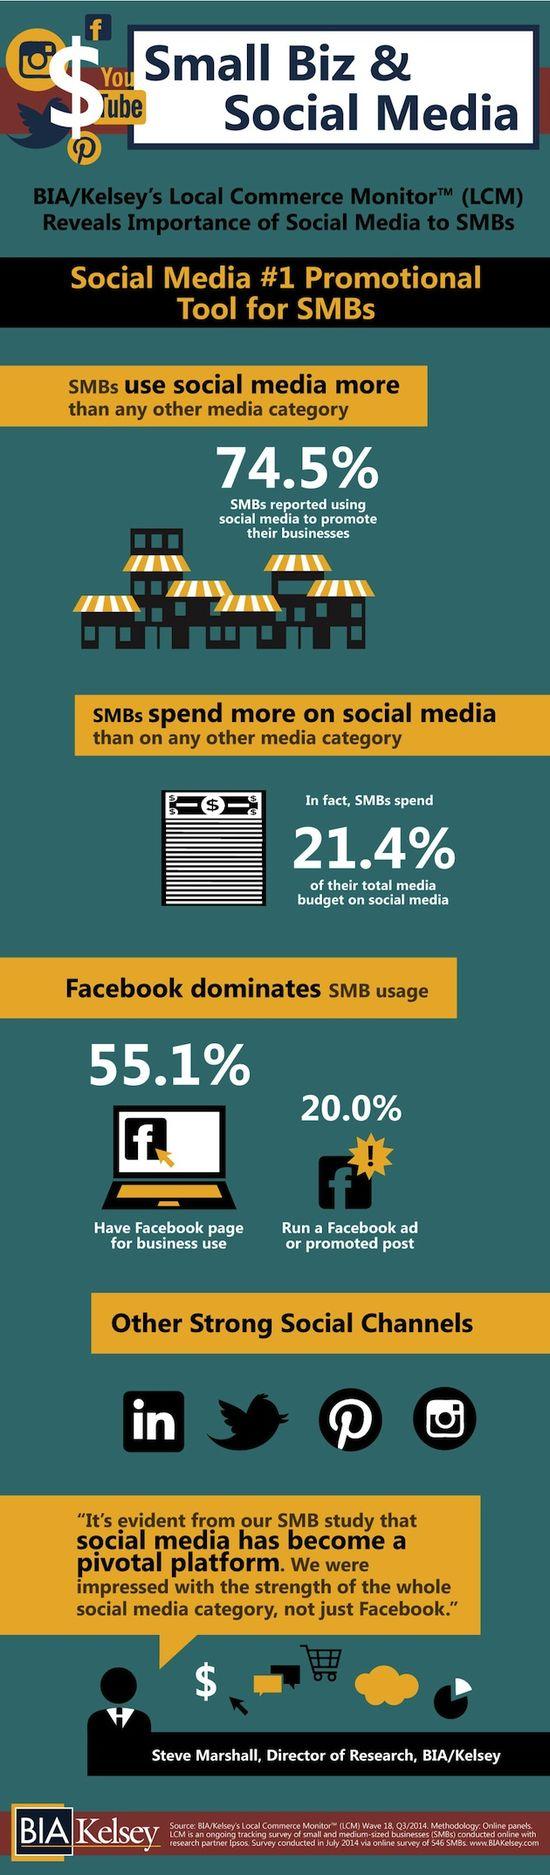 Small Biz & Socal Media